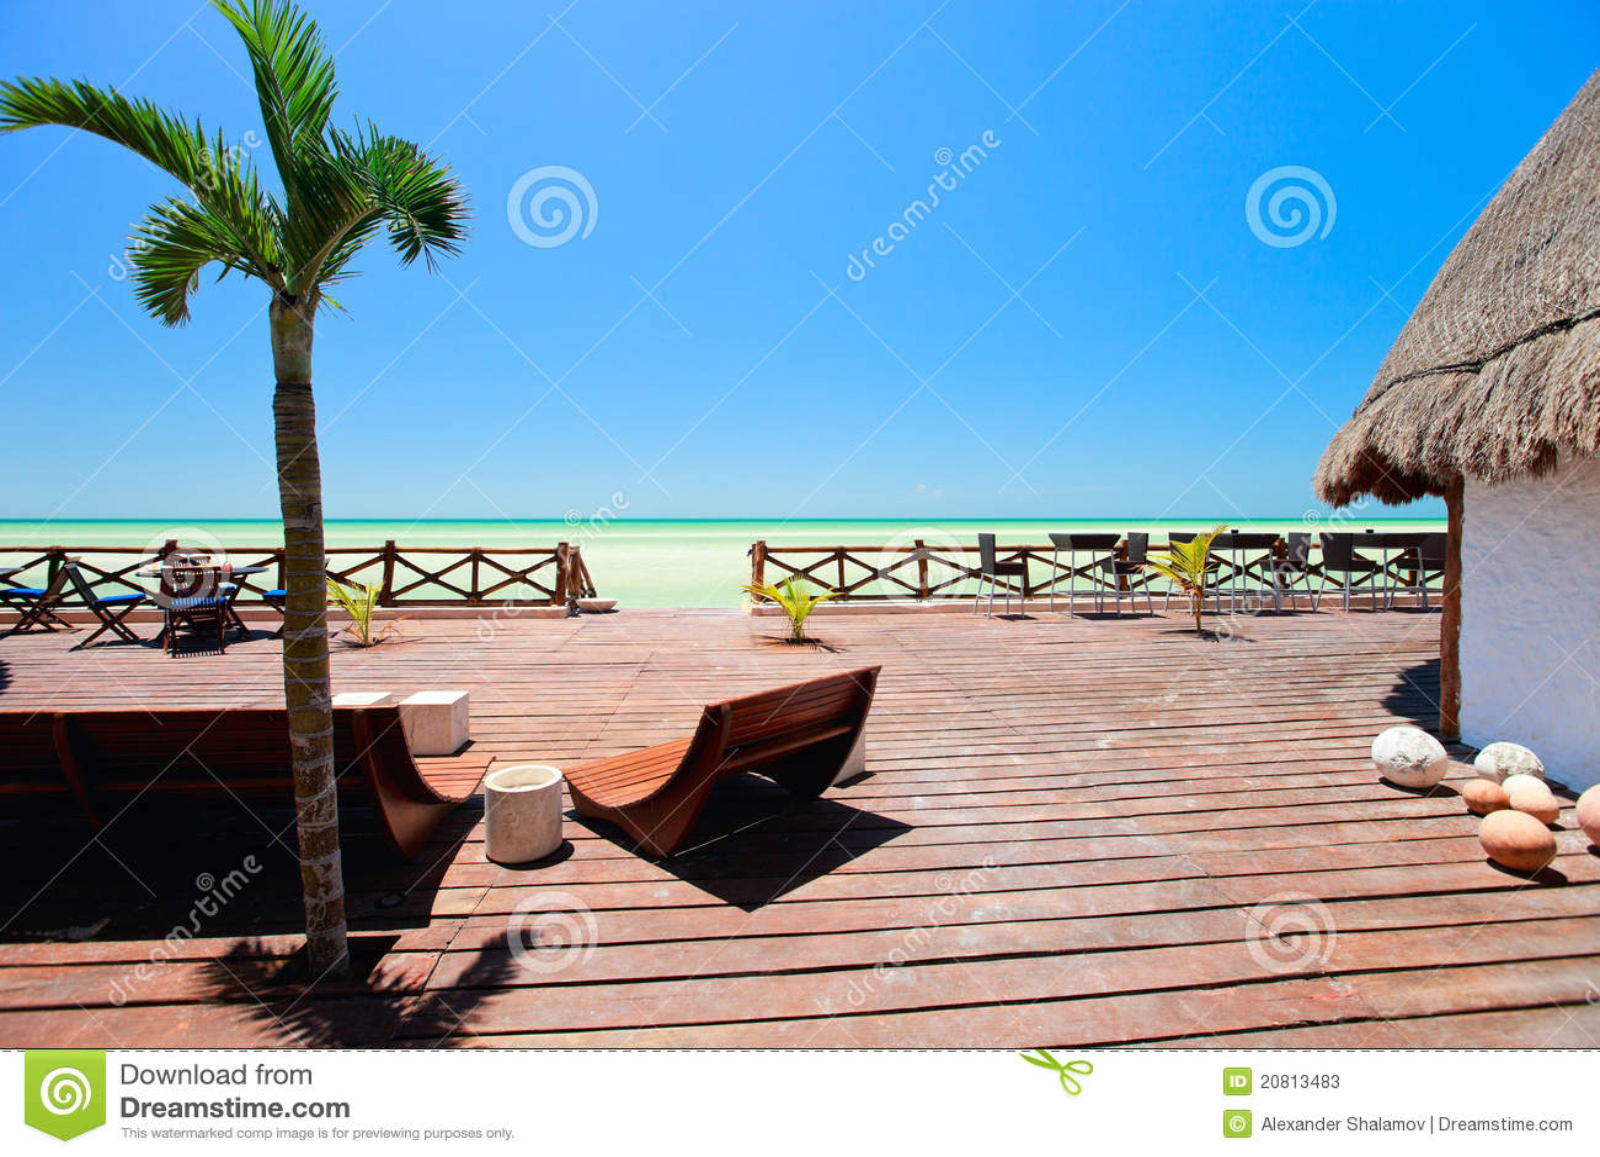 terrasse en bois de bord de la mer photos stock image 20813483. Black Bedroom Furniture Sets. Home Design Ideas